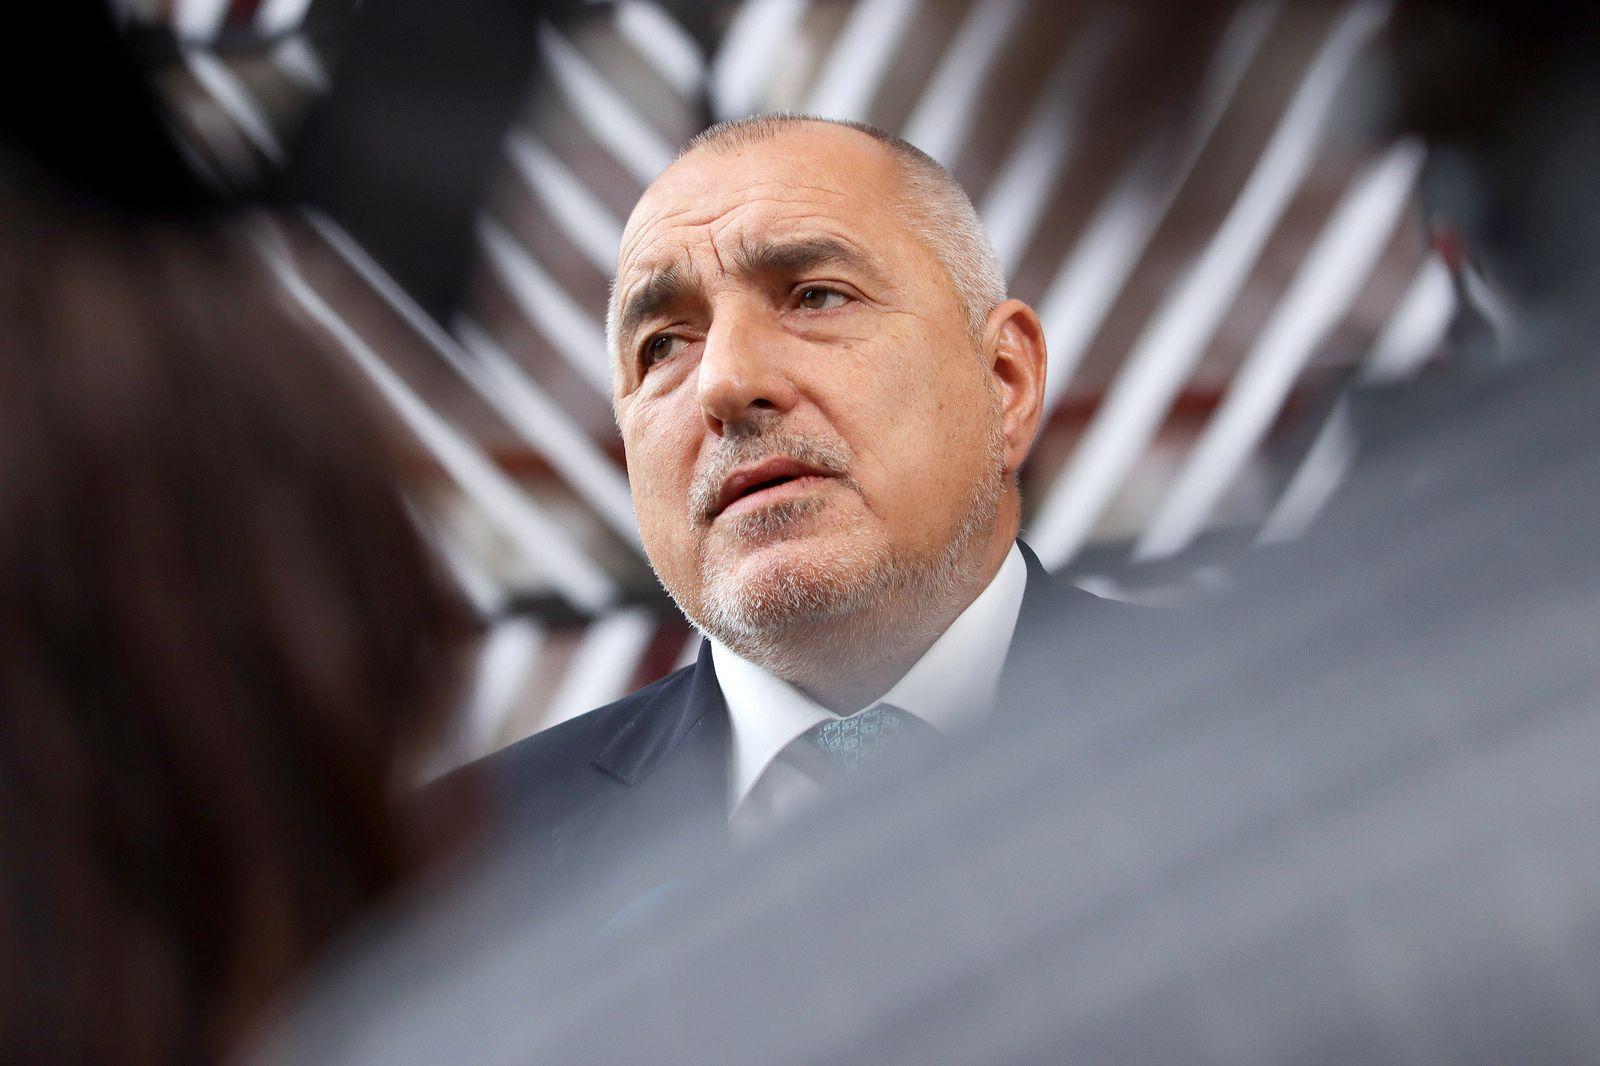 Boyko Borissov PM Of Bulgaria Attends The European Council